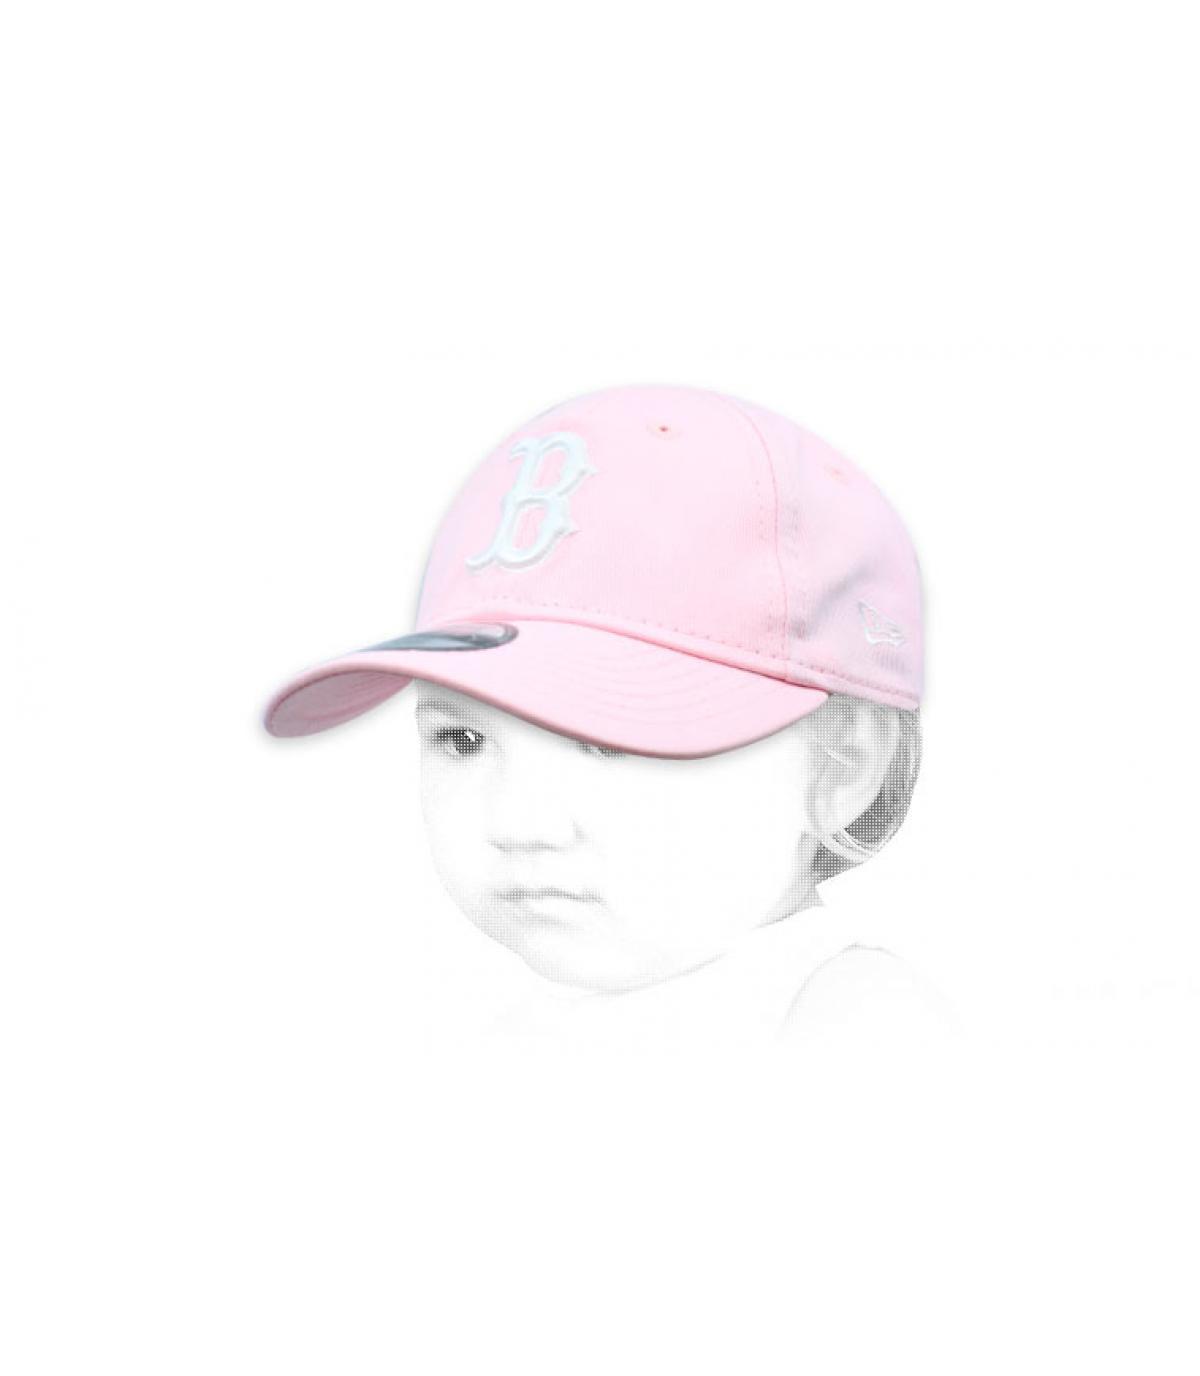 Berretta B rosa